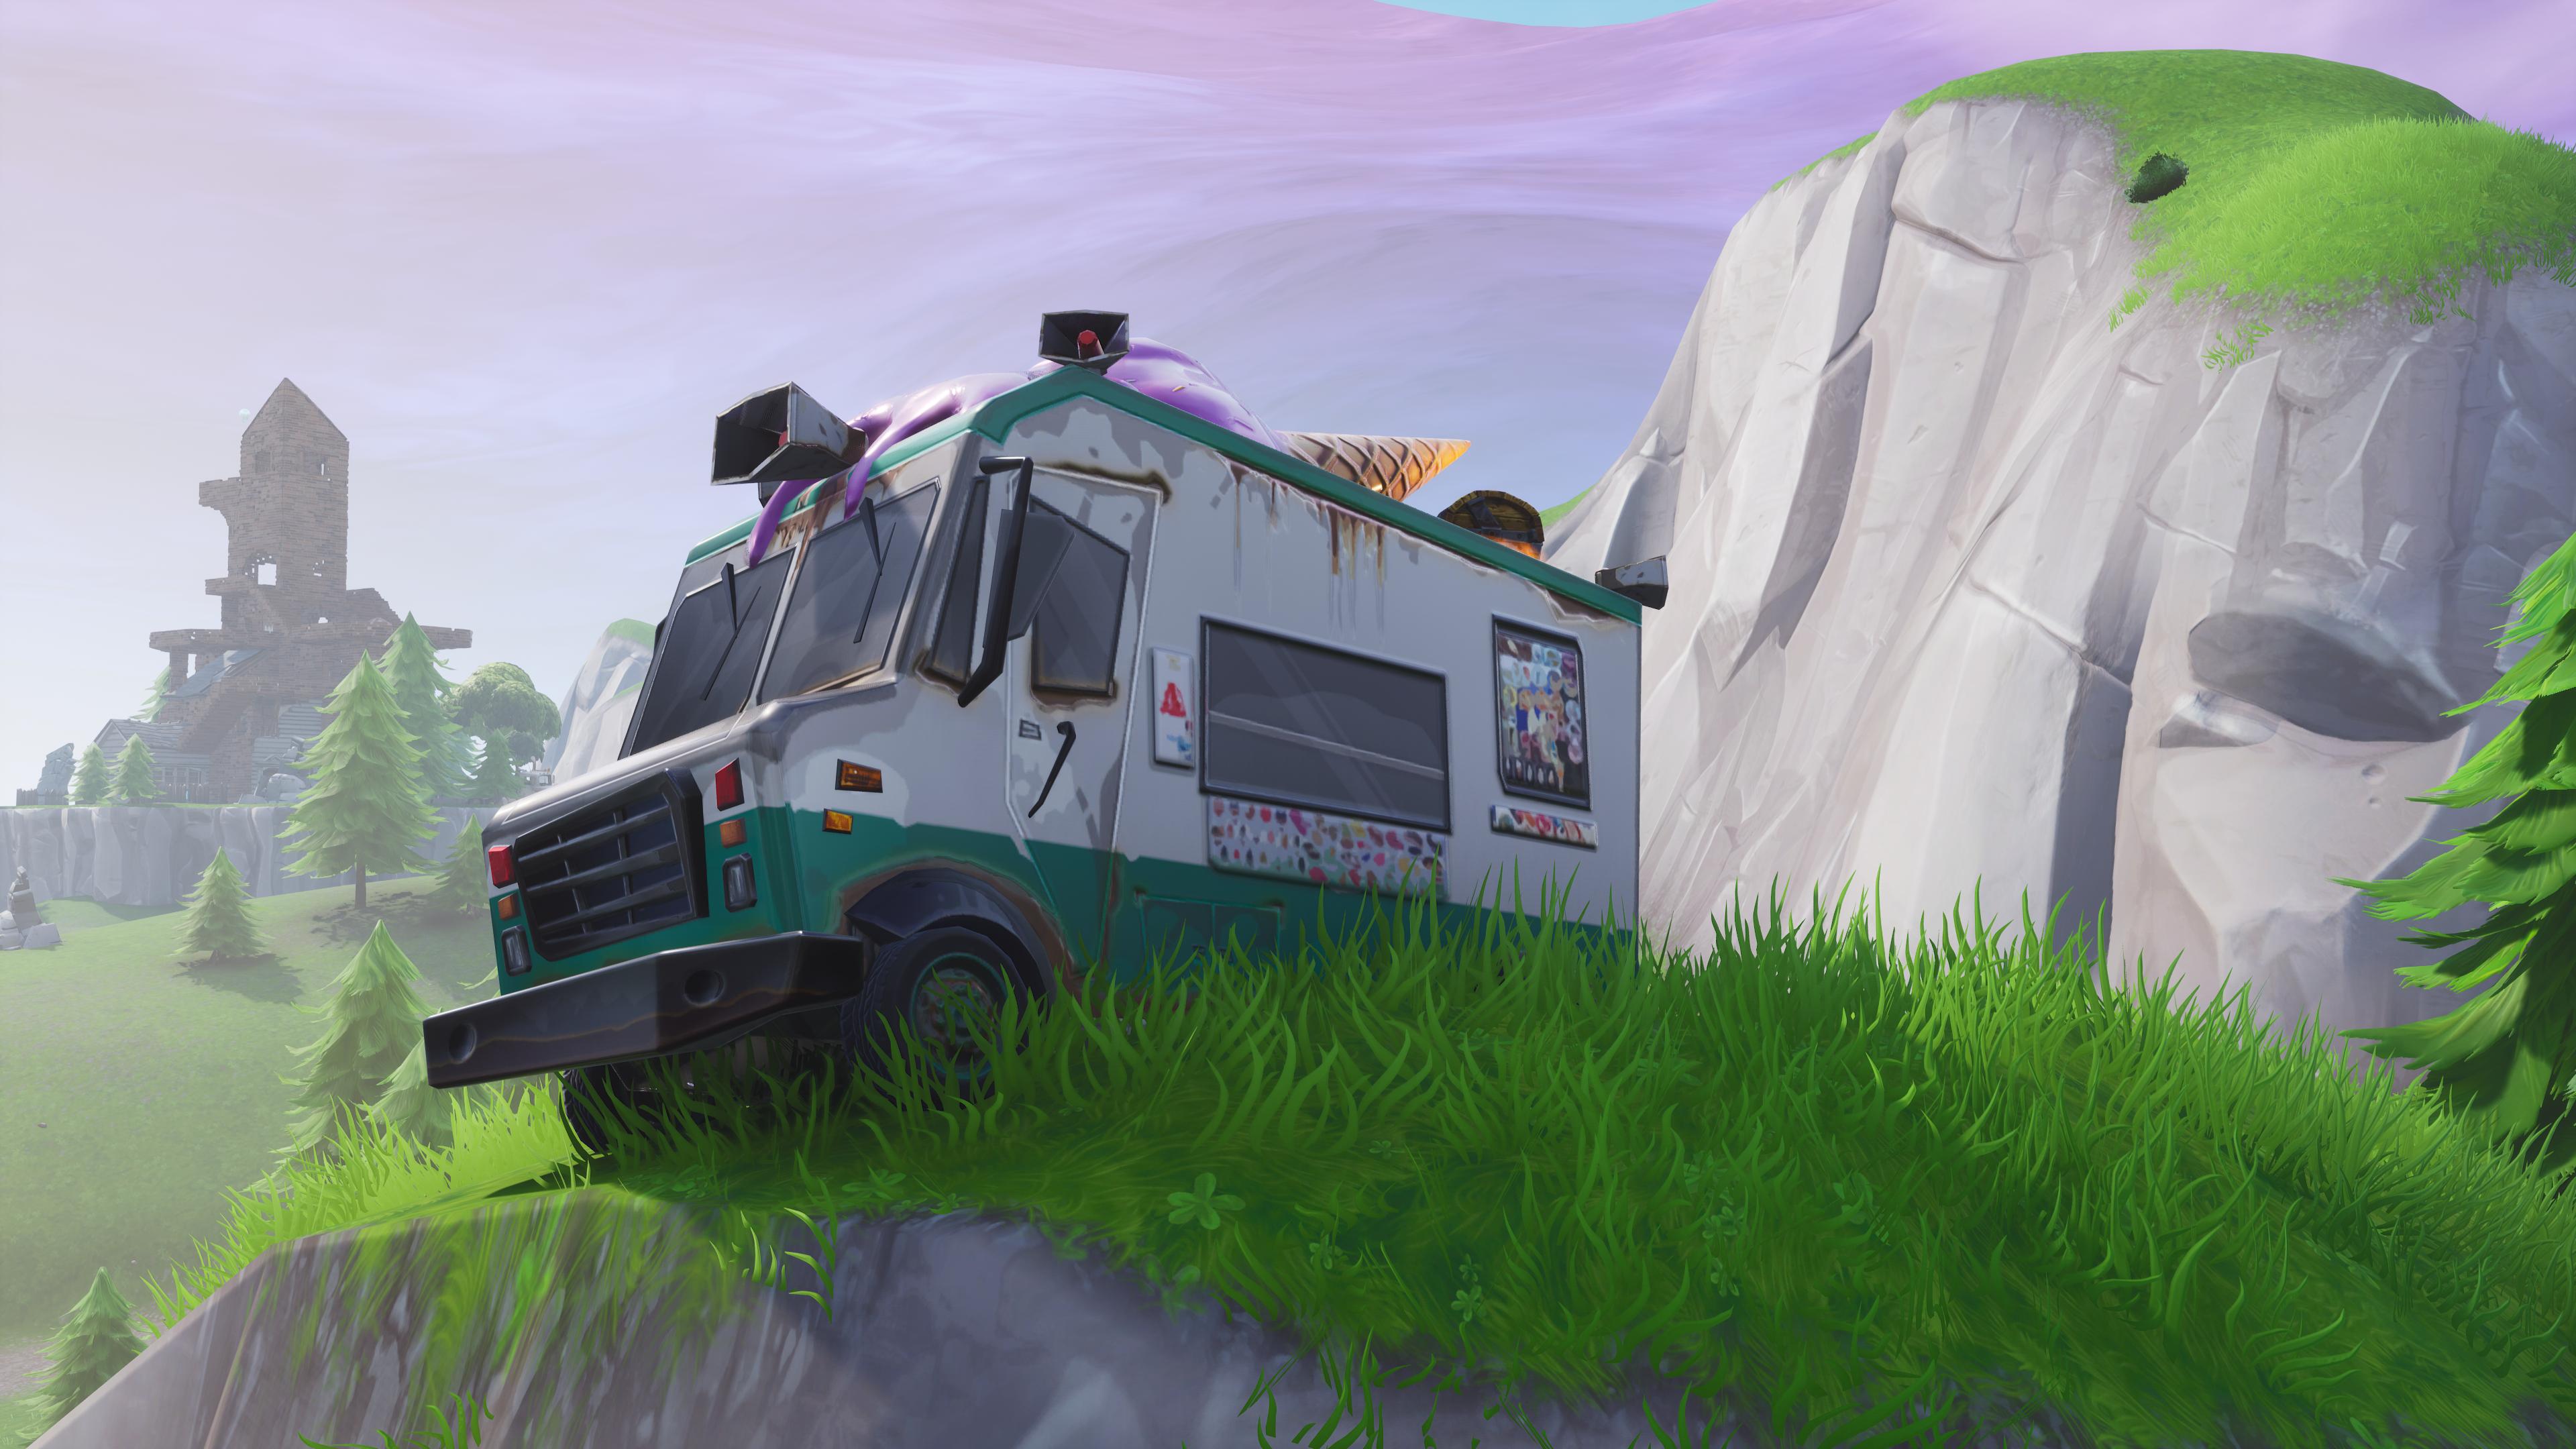 Fortnite Ice Cream truck 4k Ultra HD Wallpaper | Background